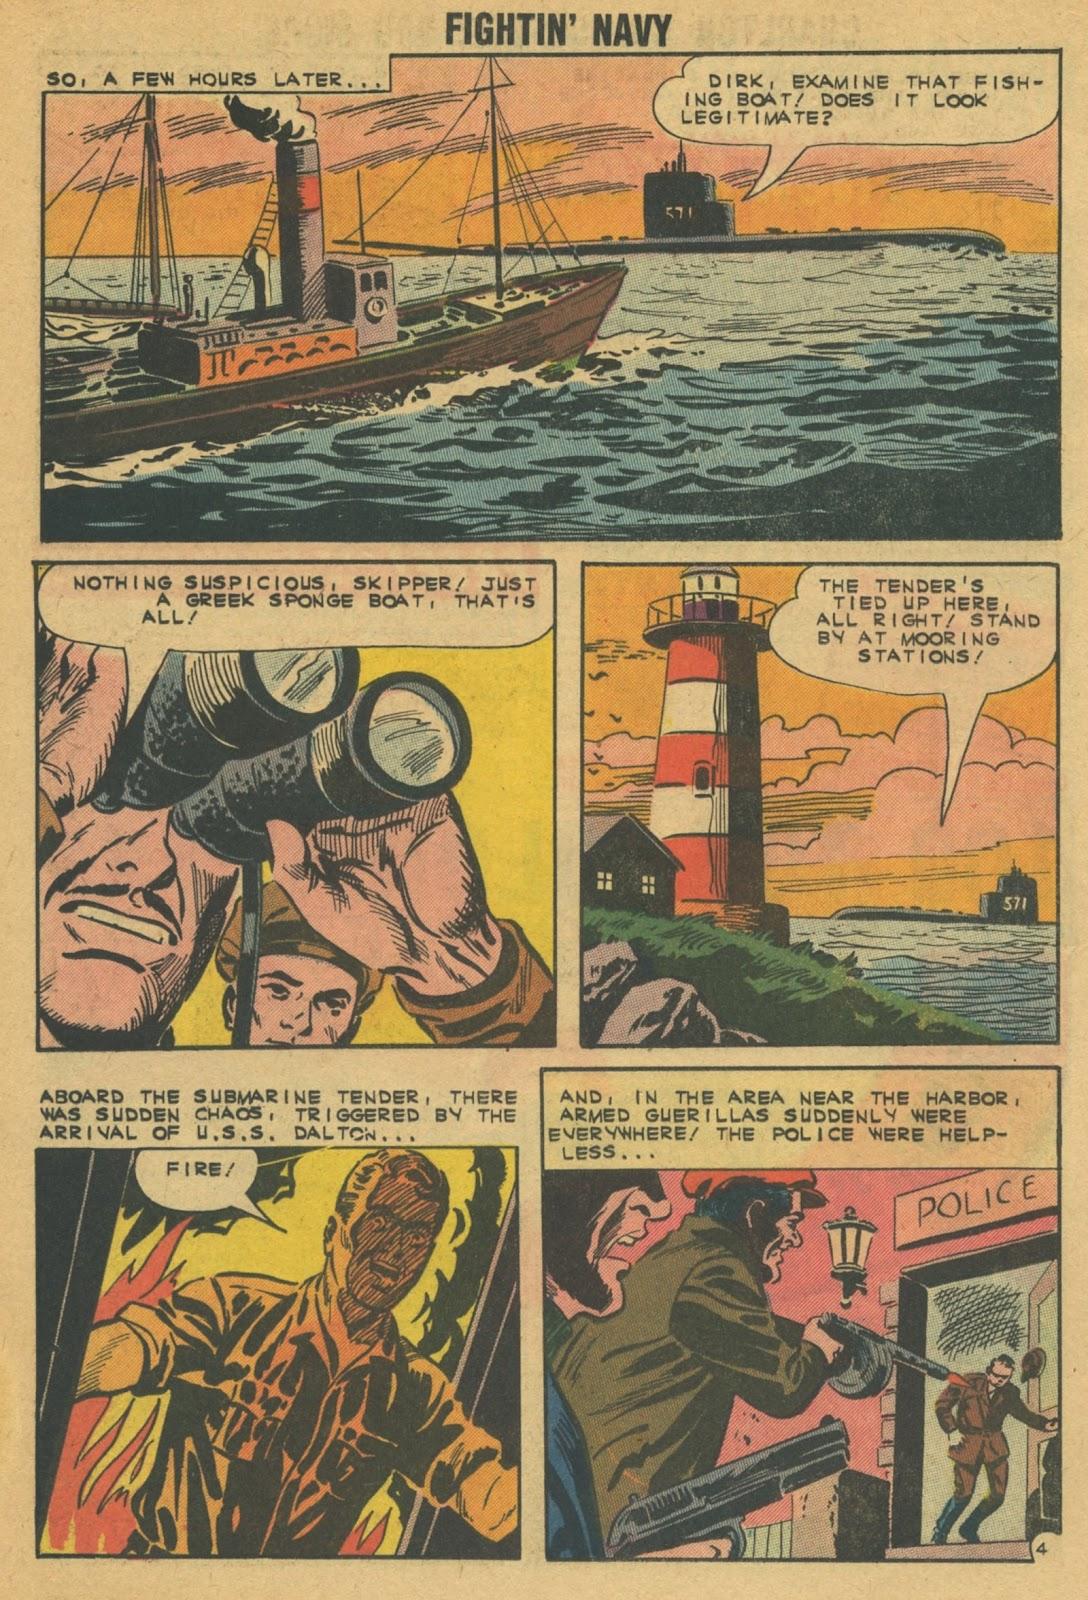 Read online Fightin' Navy comic -  Issue #103 - 16